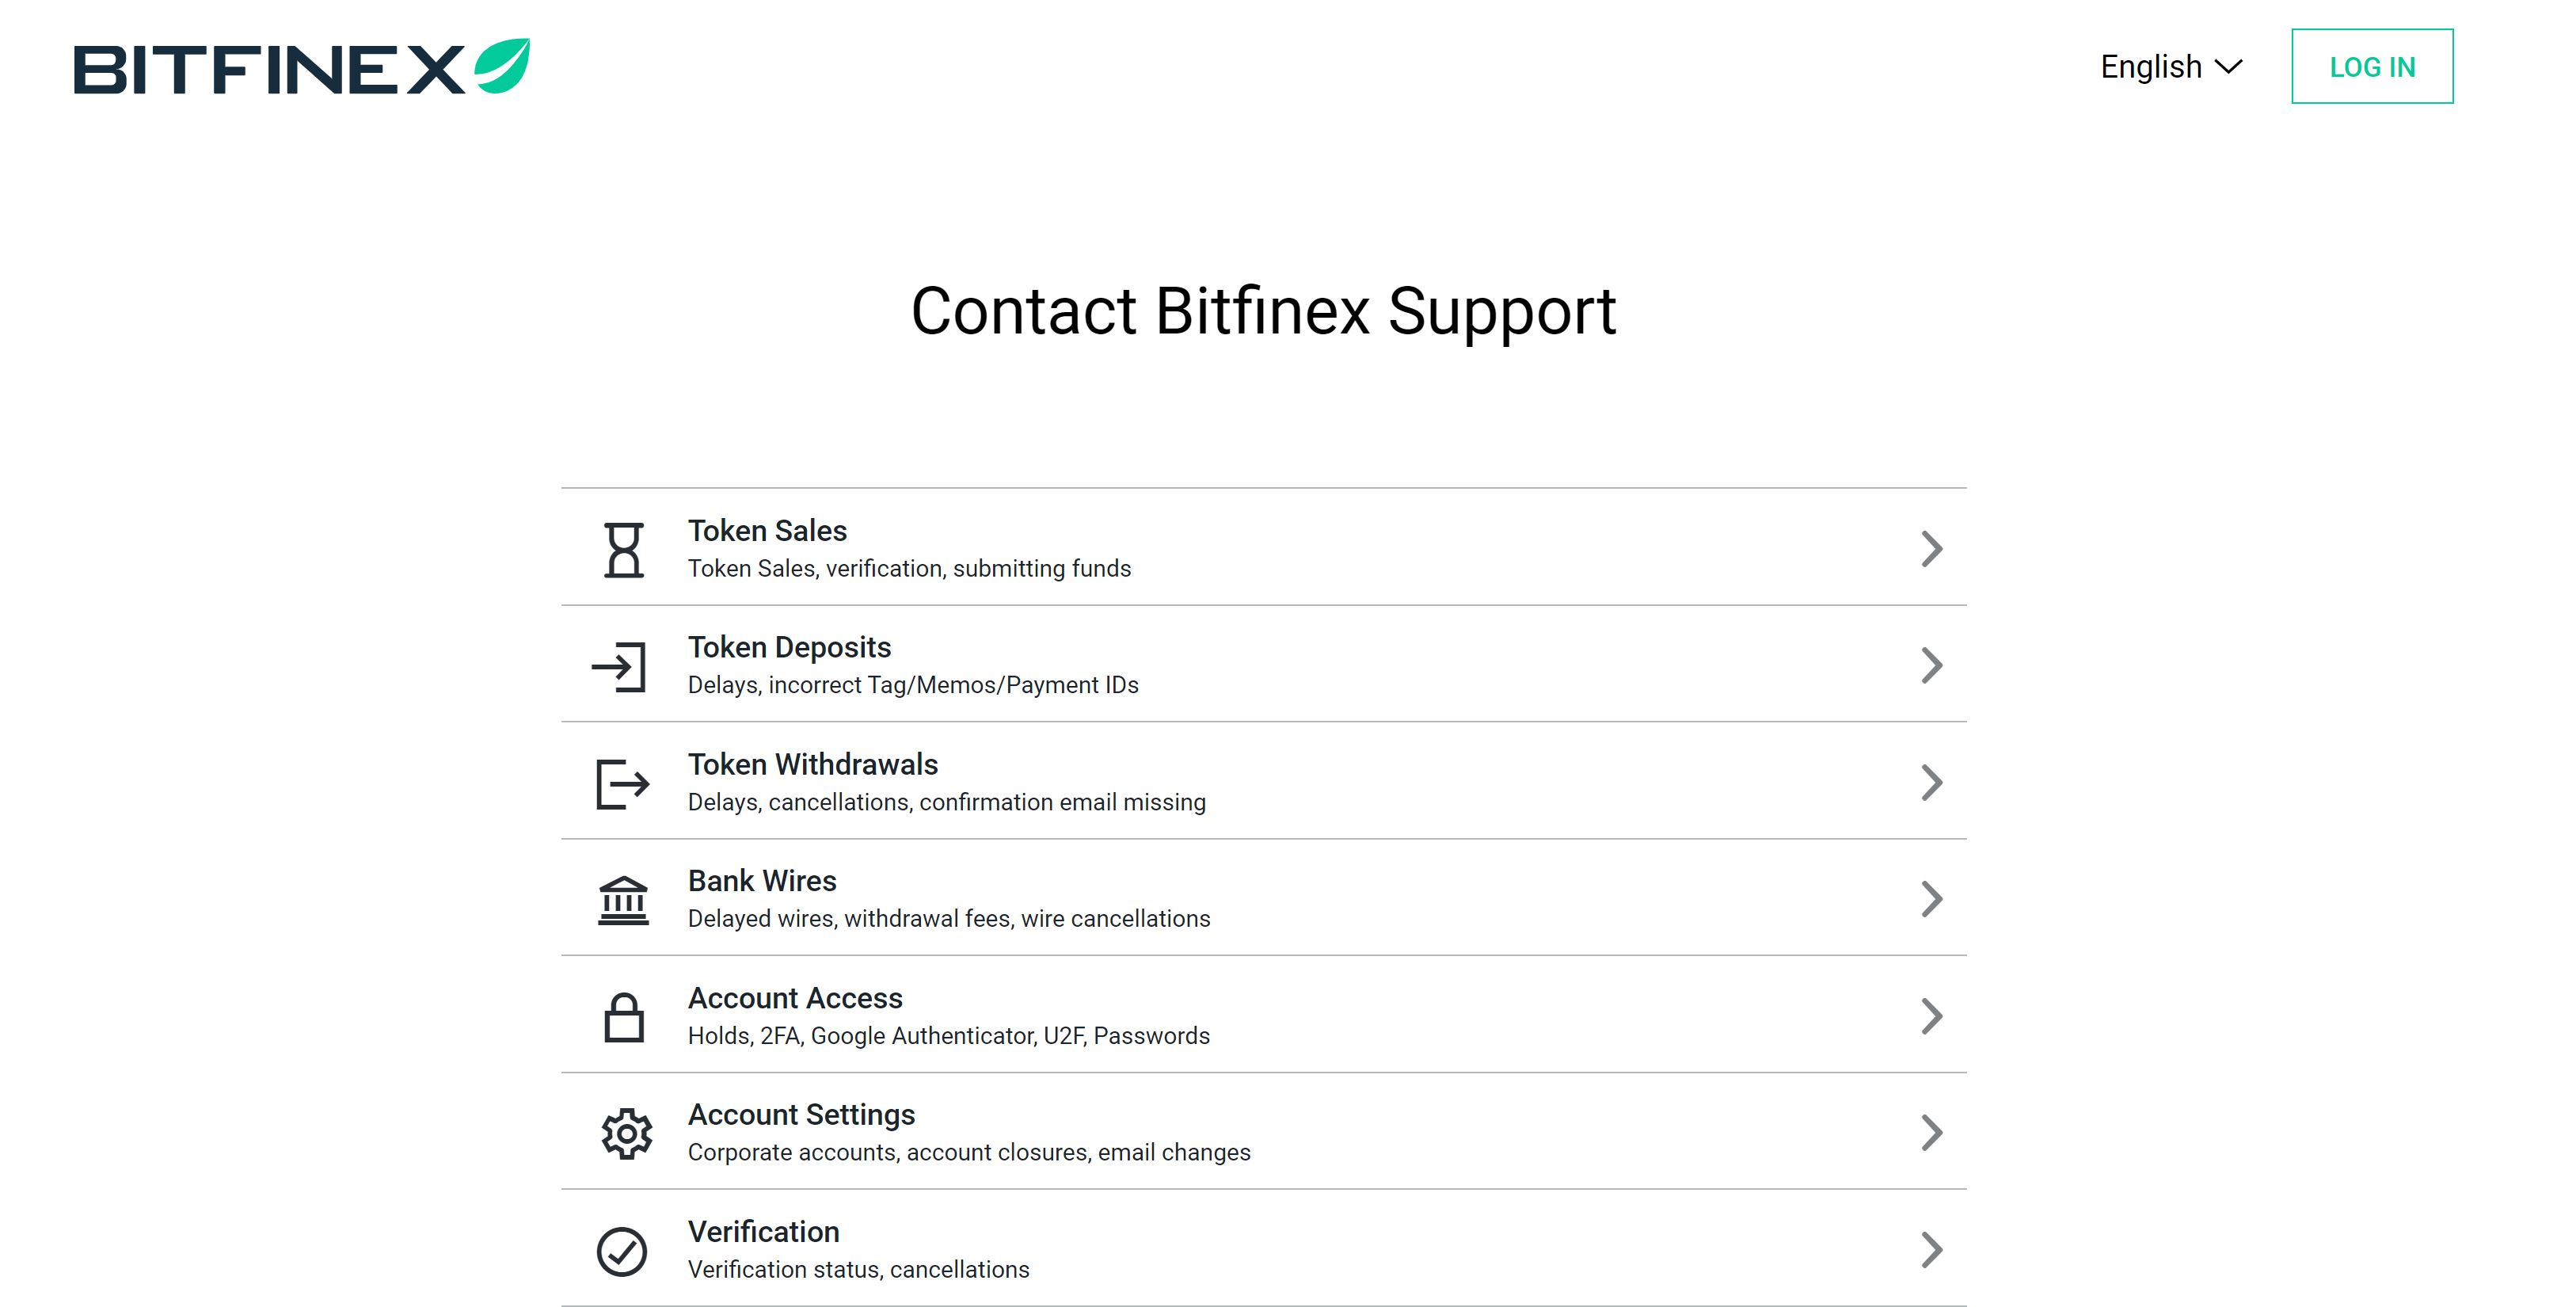 Bitfinex customer support